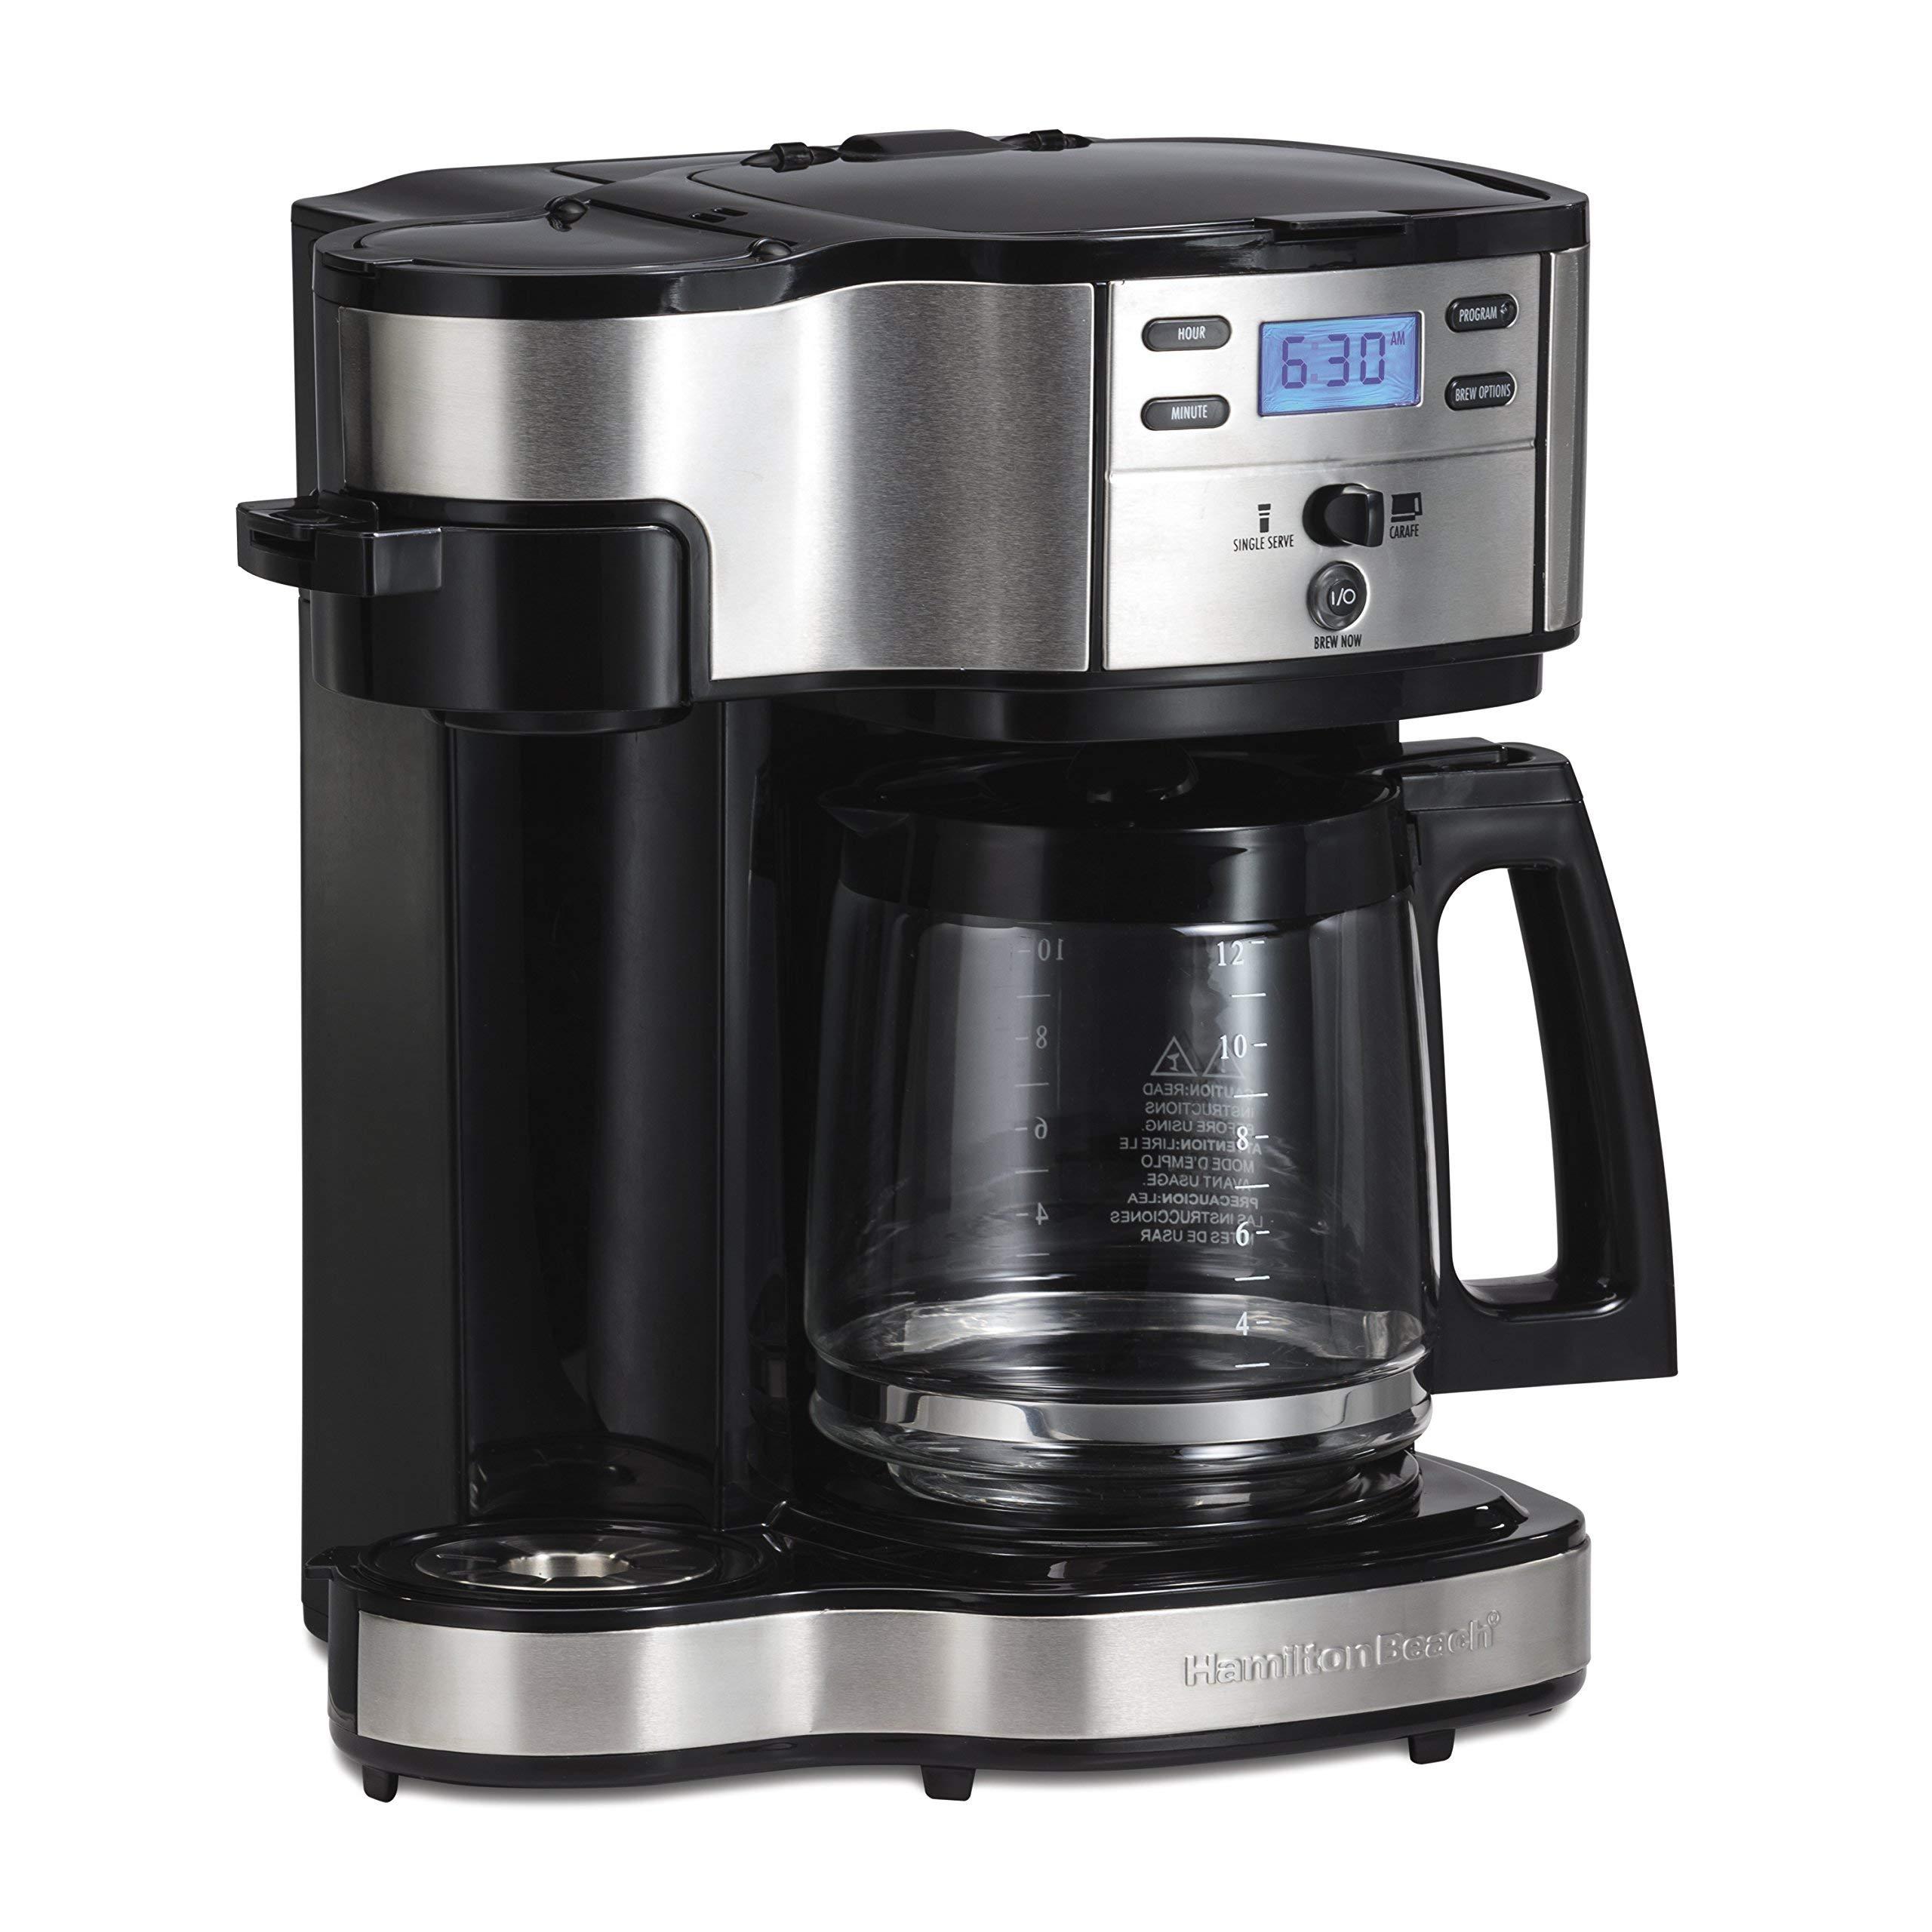 Hamilton Beach (49980A) Single Serve Coffee Maker and Coffee Pot Maker, Programmable, Black/Stainless Steel (Renewed) by Hamilton Beach